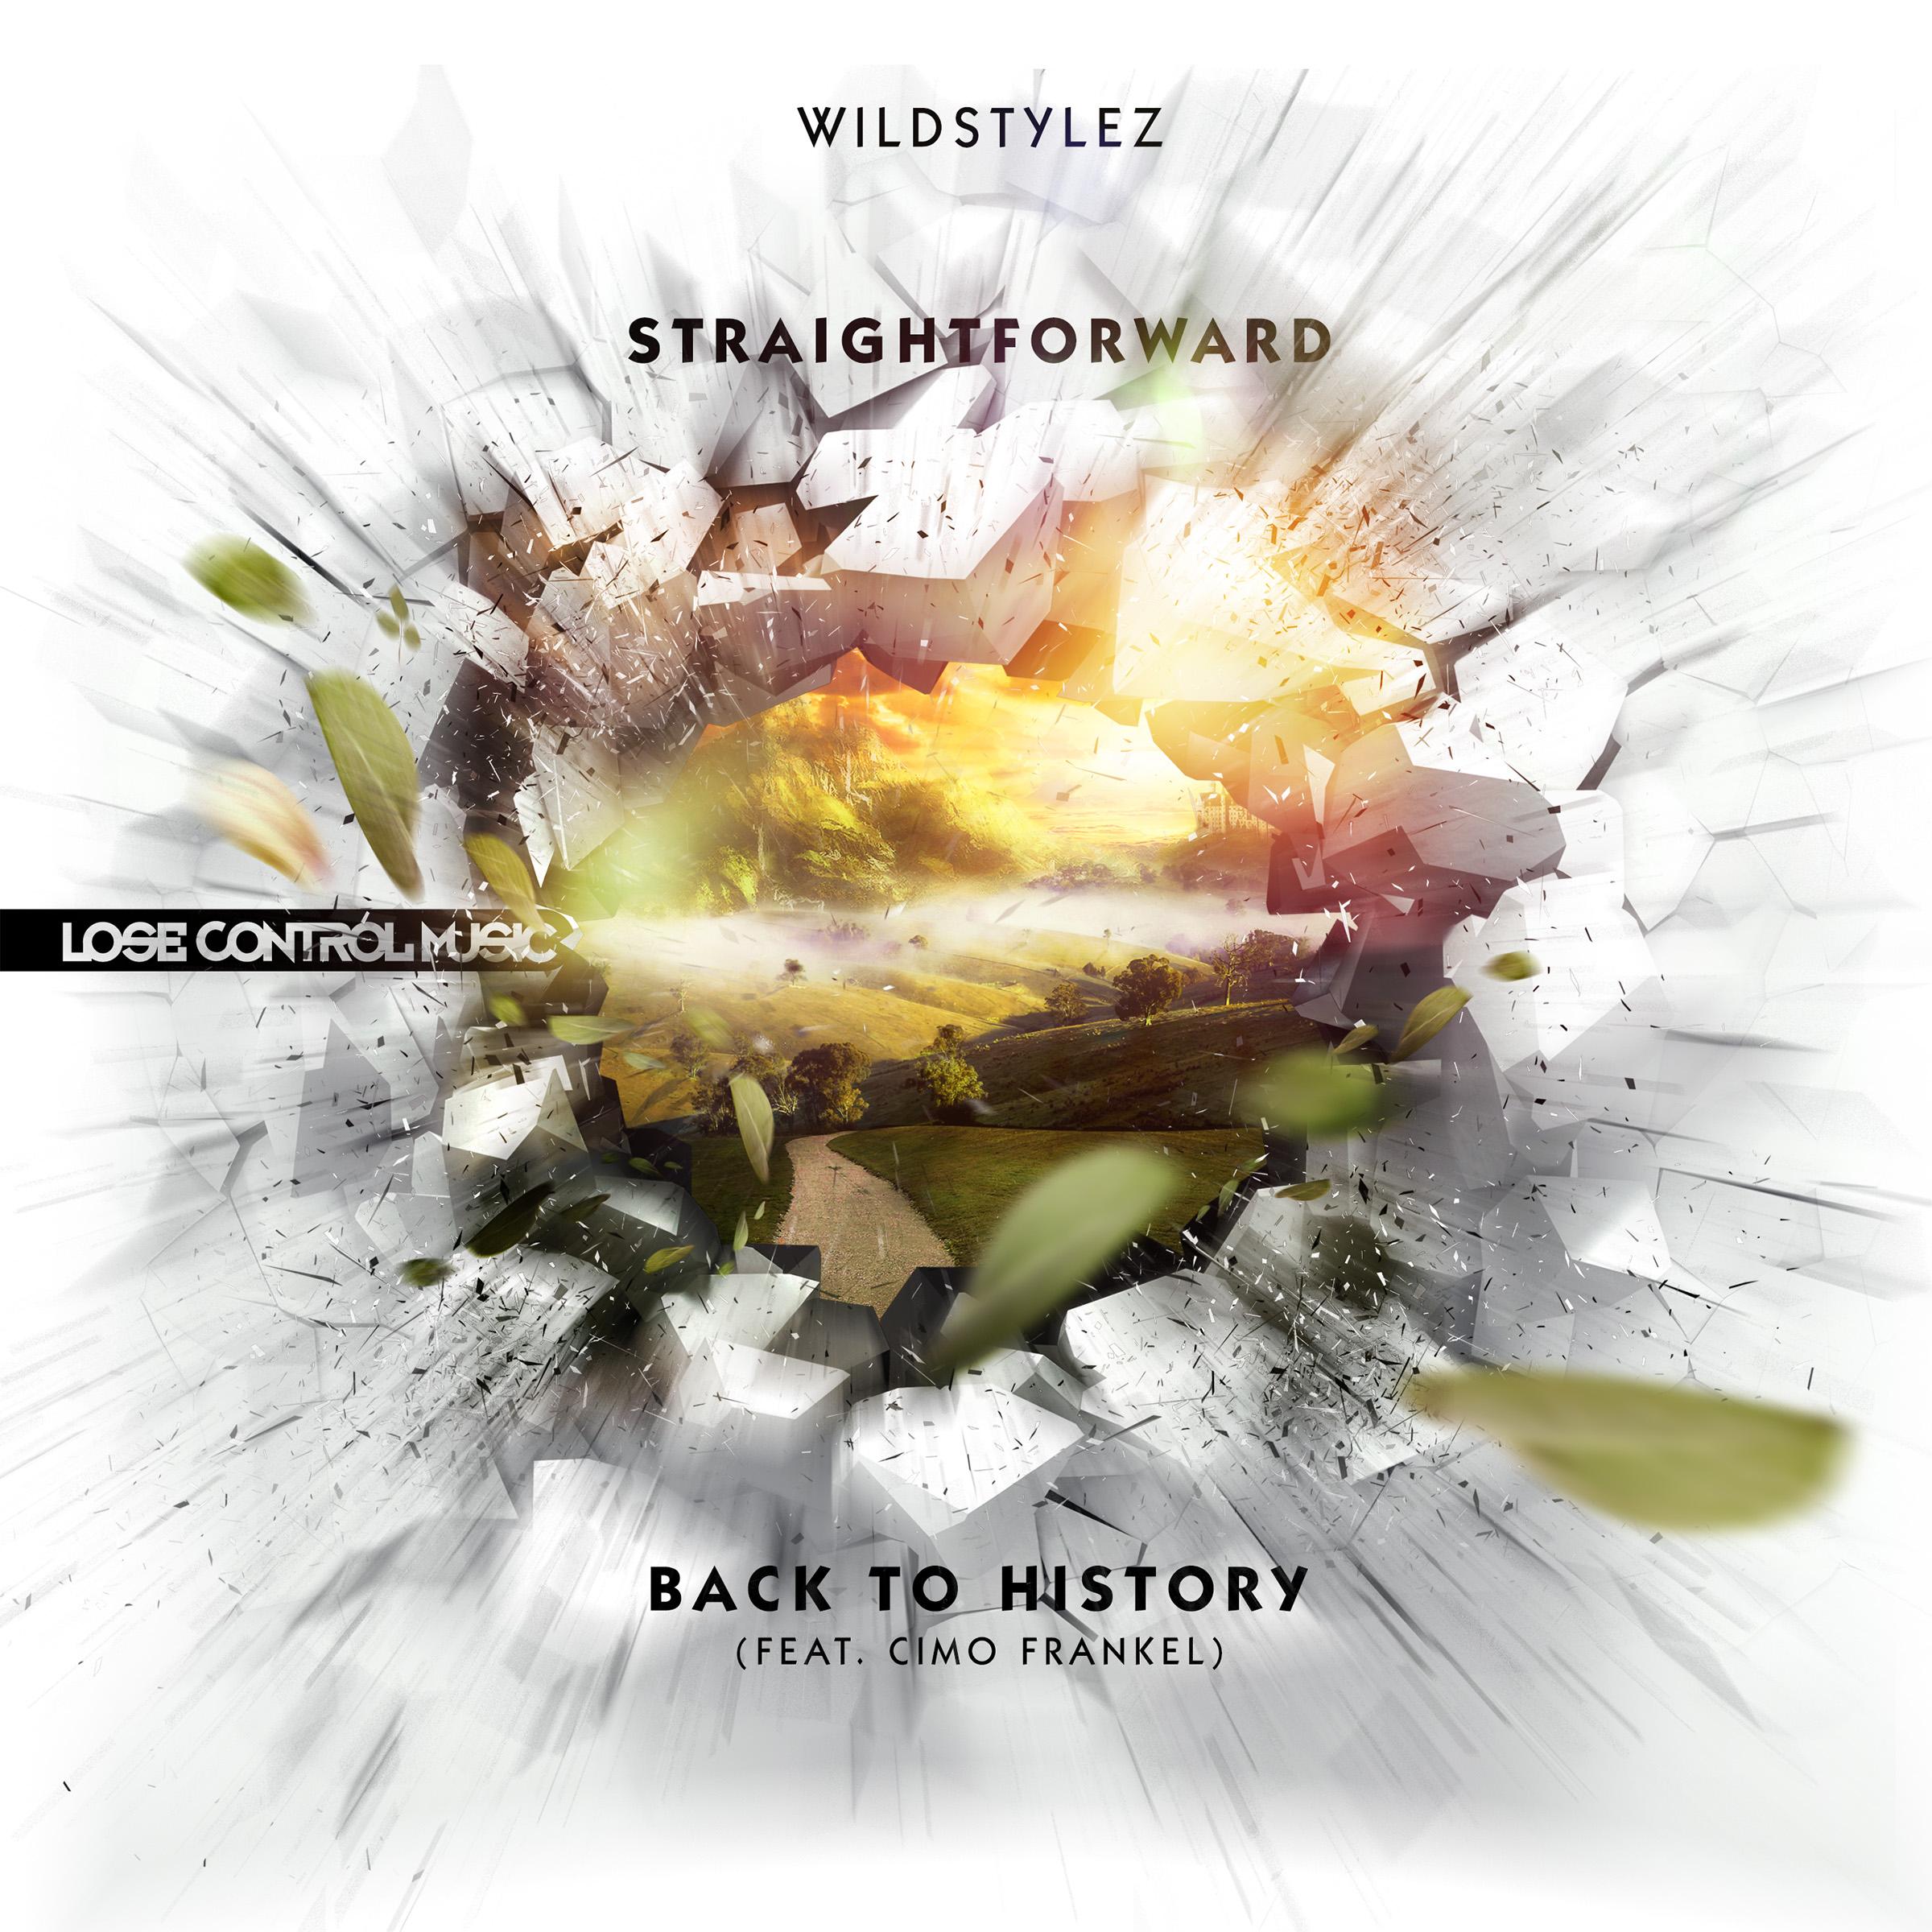 LCM004_Wildstylez - Straightforward_Back To History 2400x2400